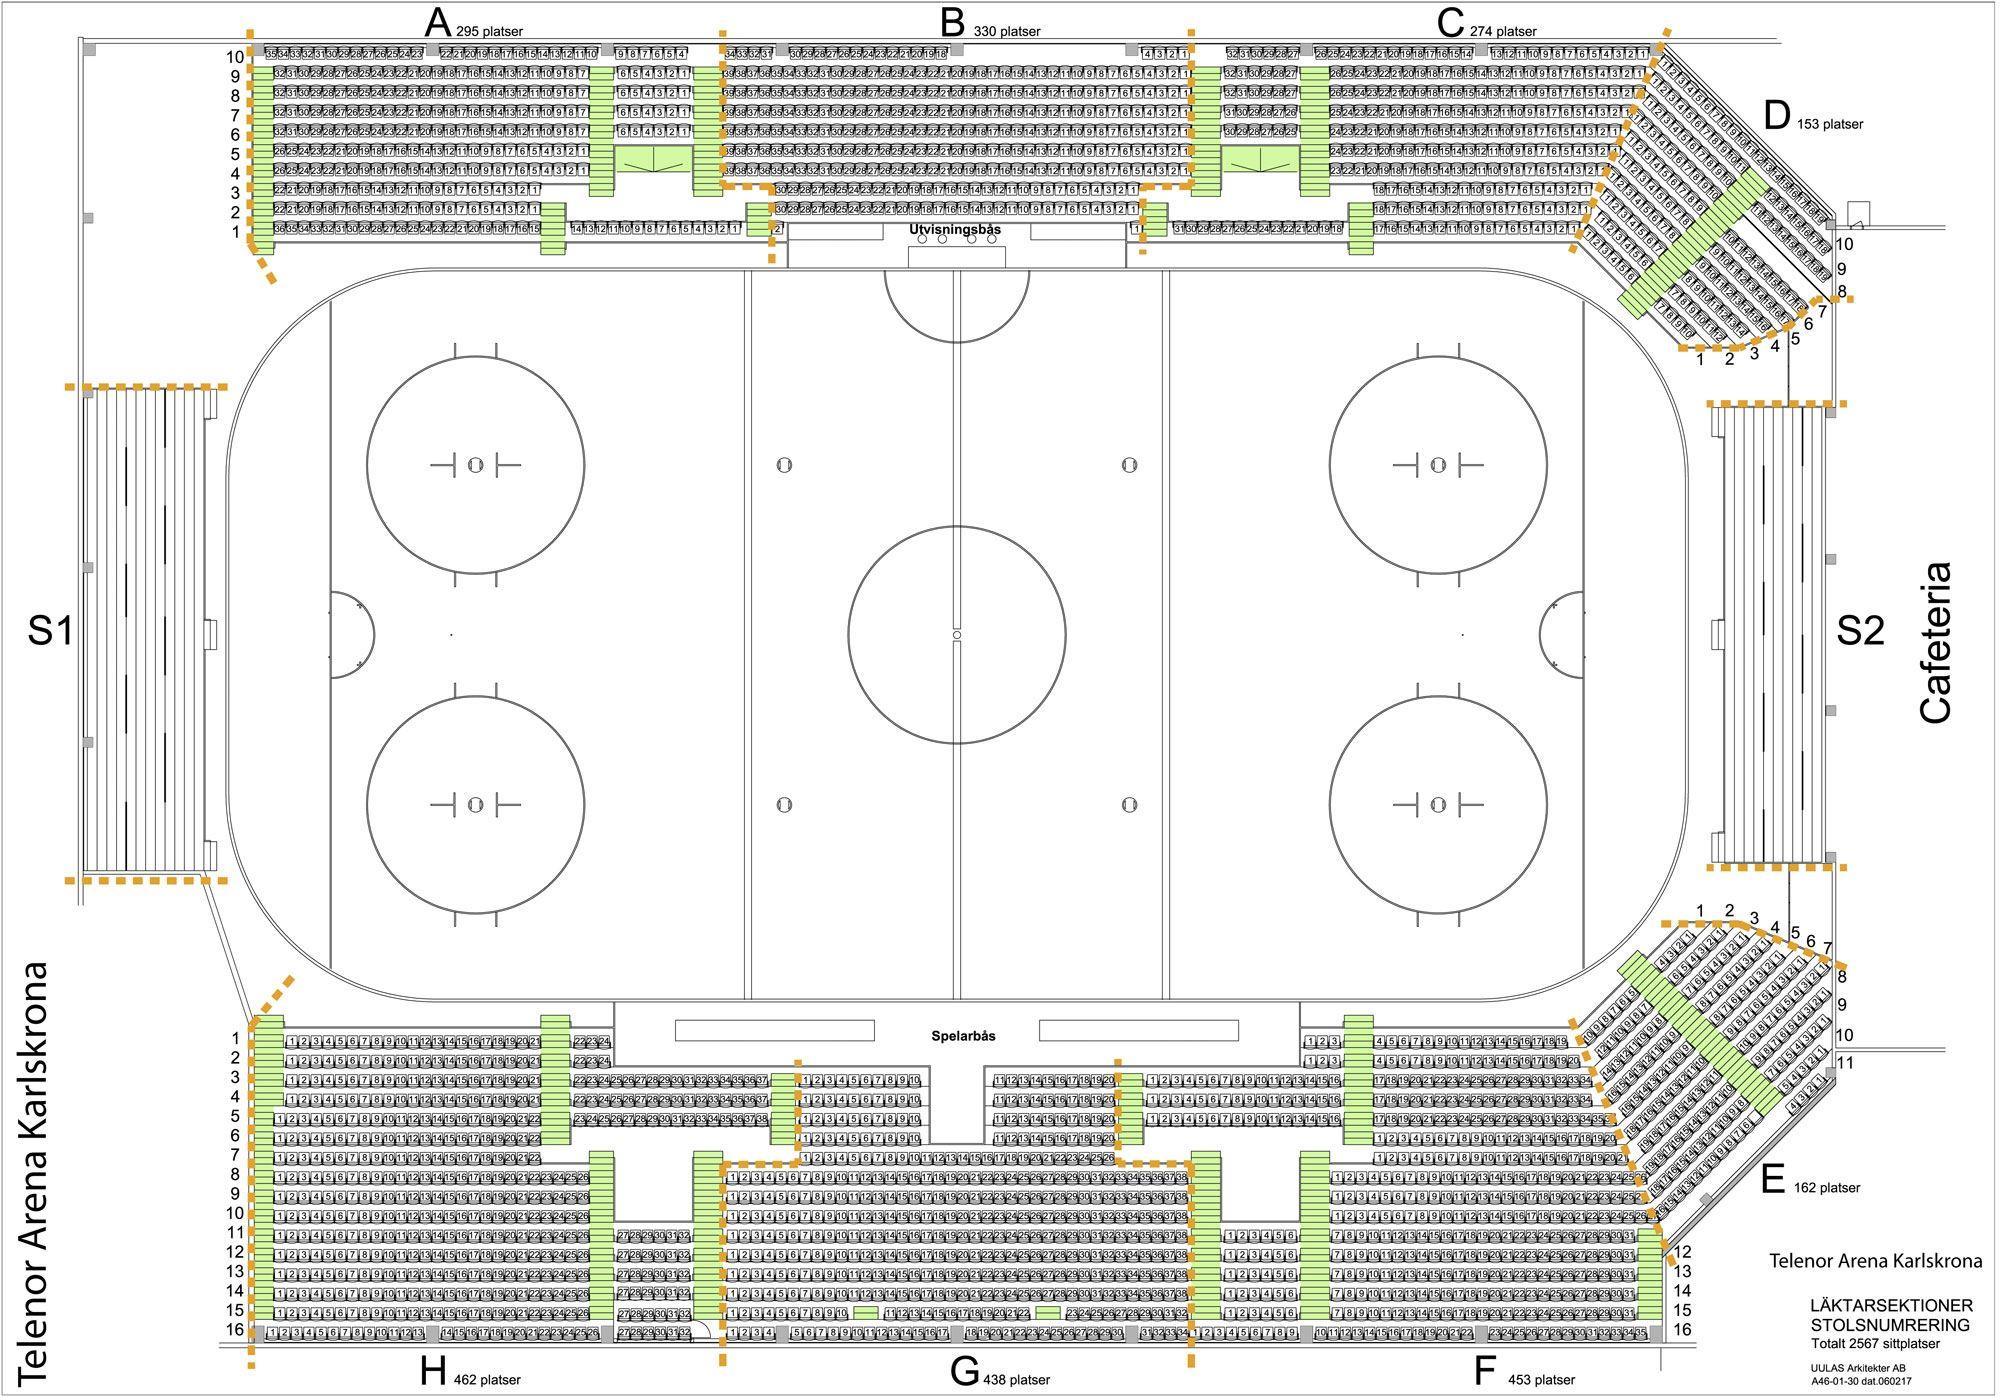 ABB Arena Karlskrona